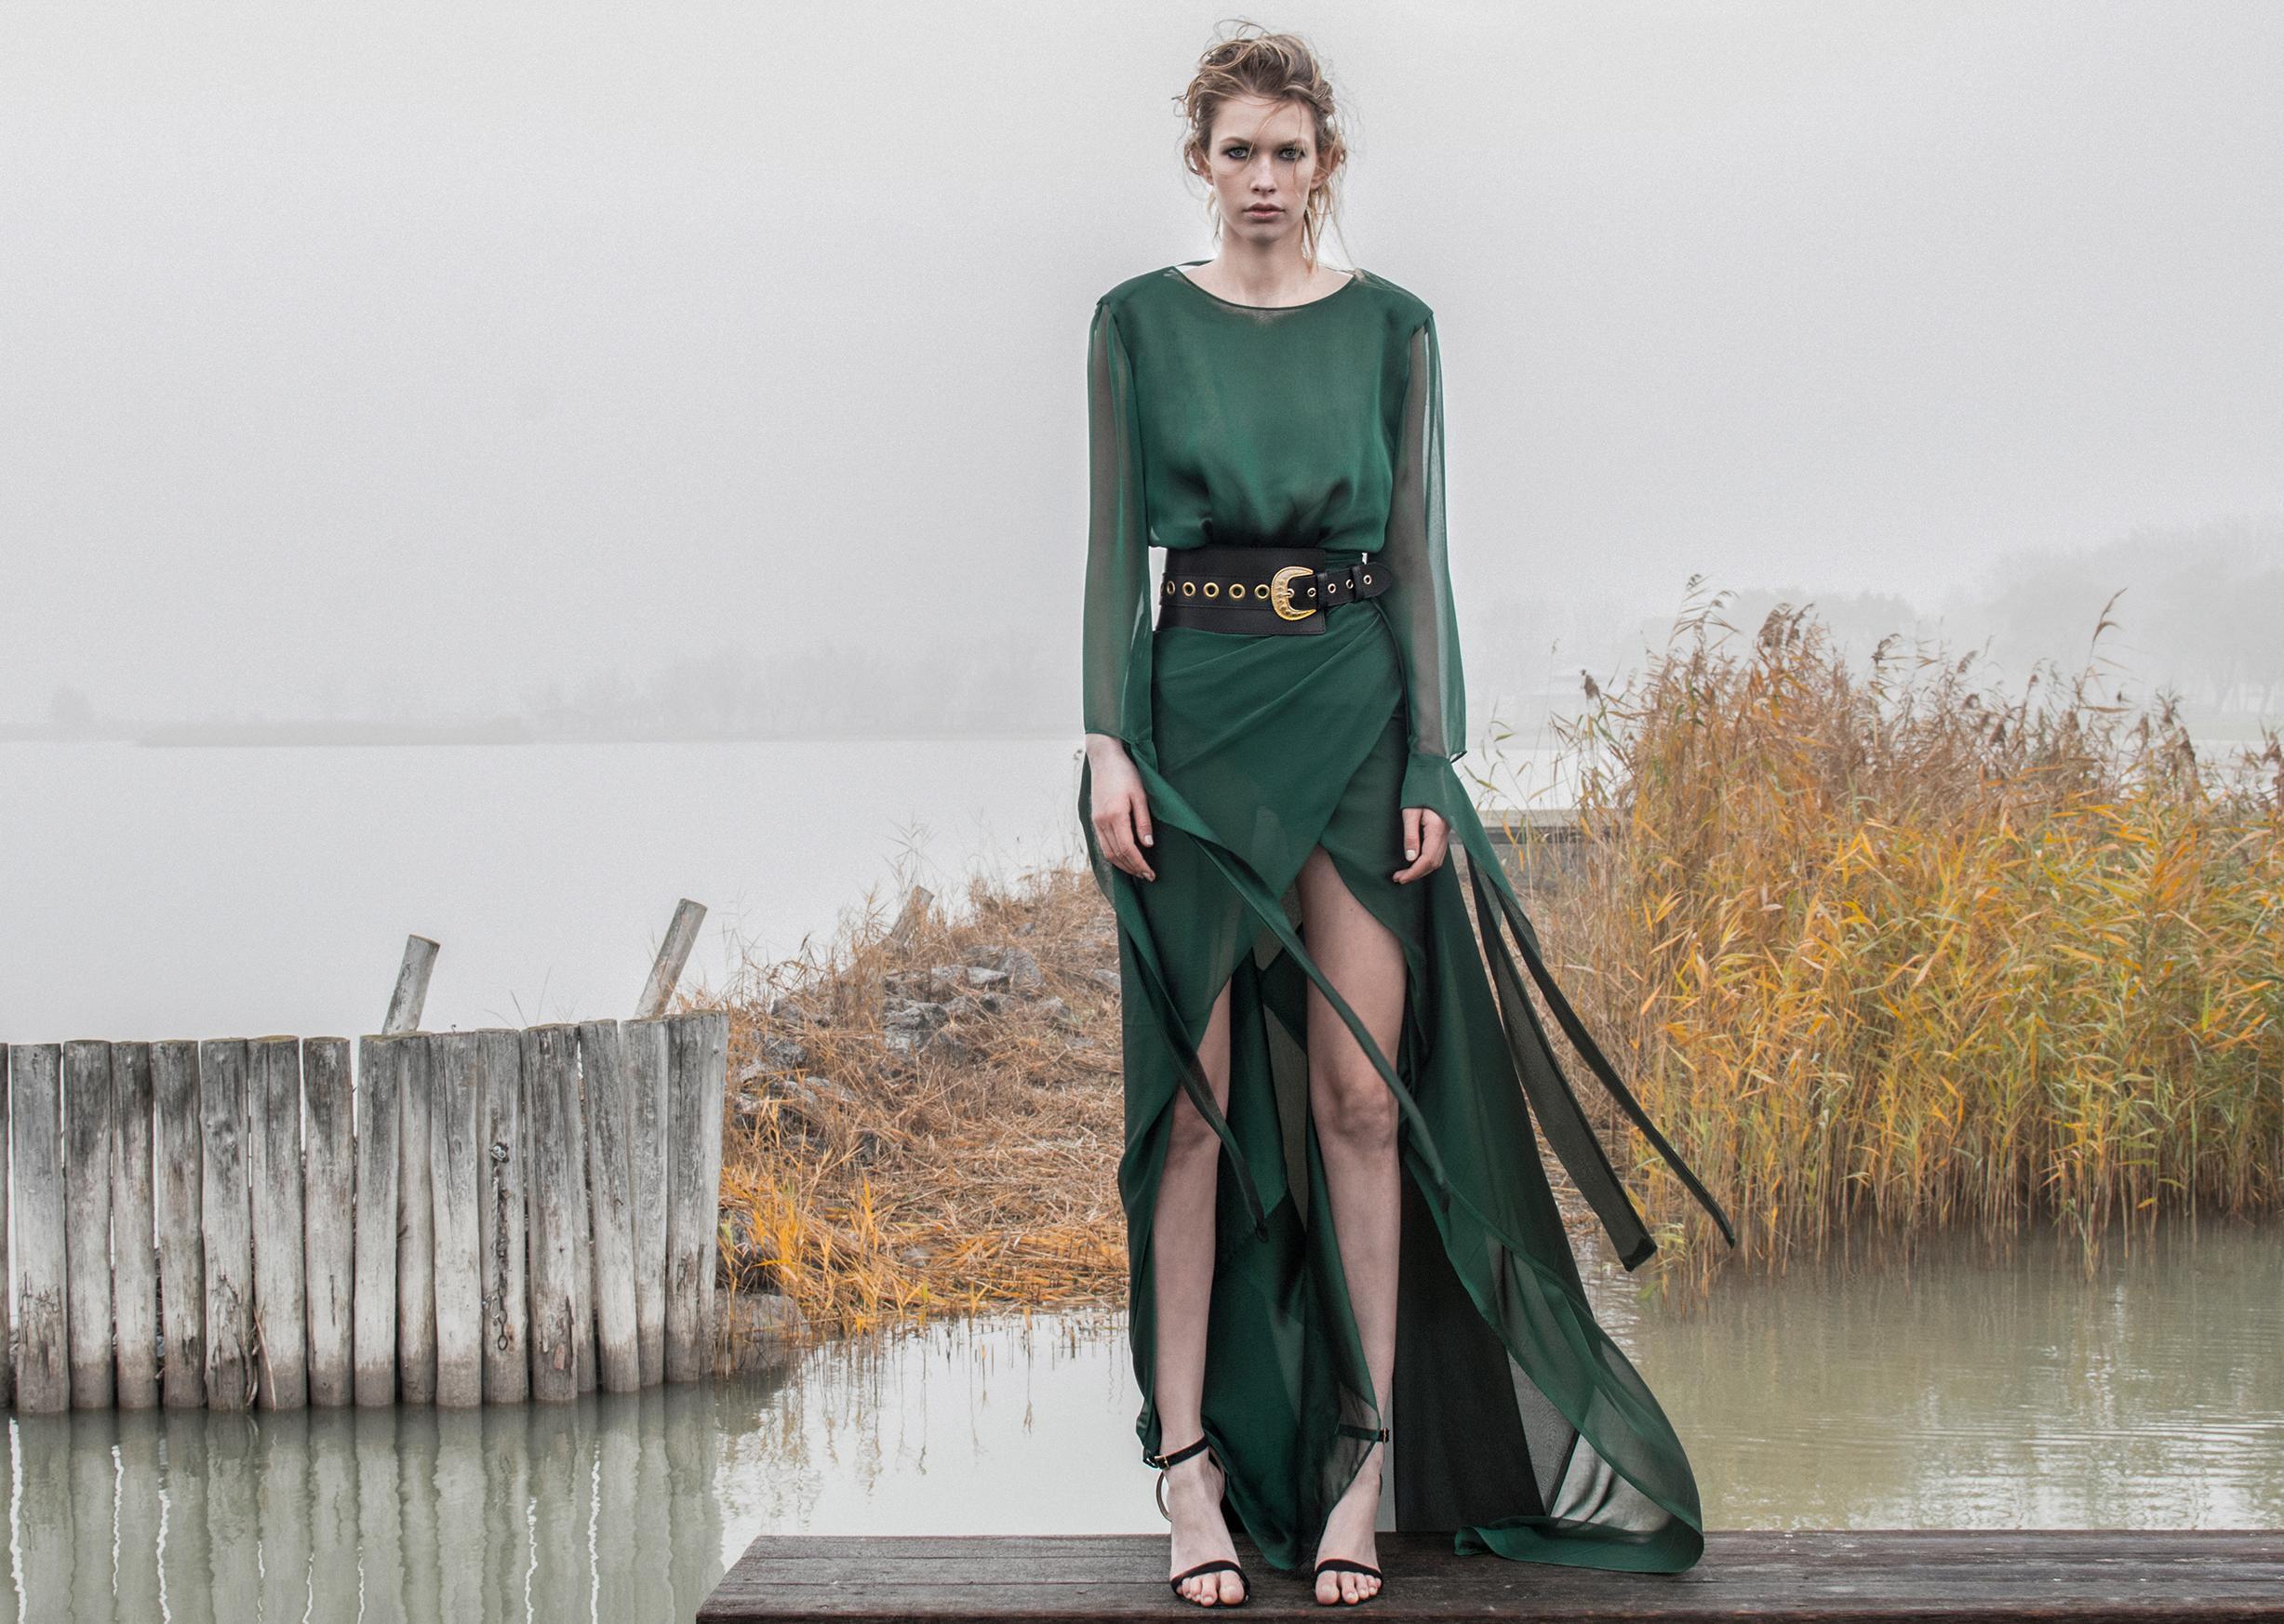 Talentirane dizajnerice brenda Mateyaneira snimile kampanju u predivnoj prirodi nadomak Beča